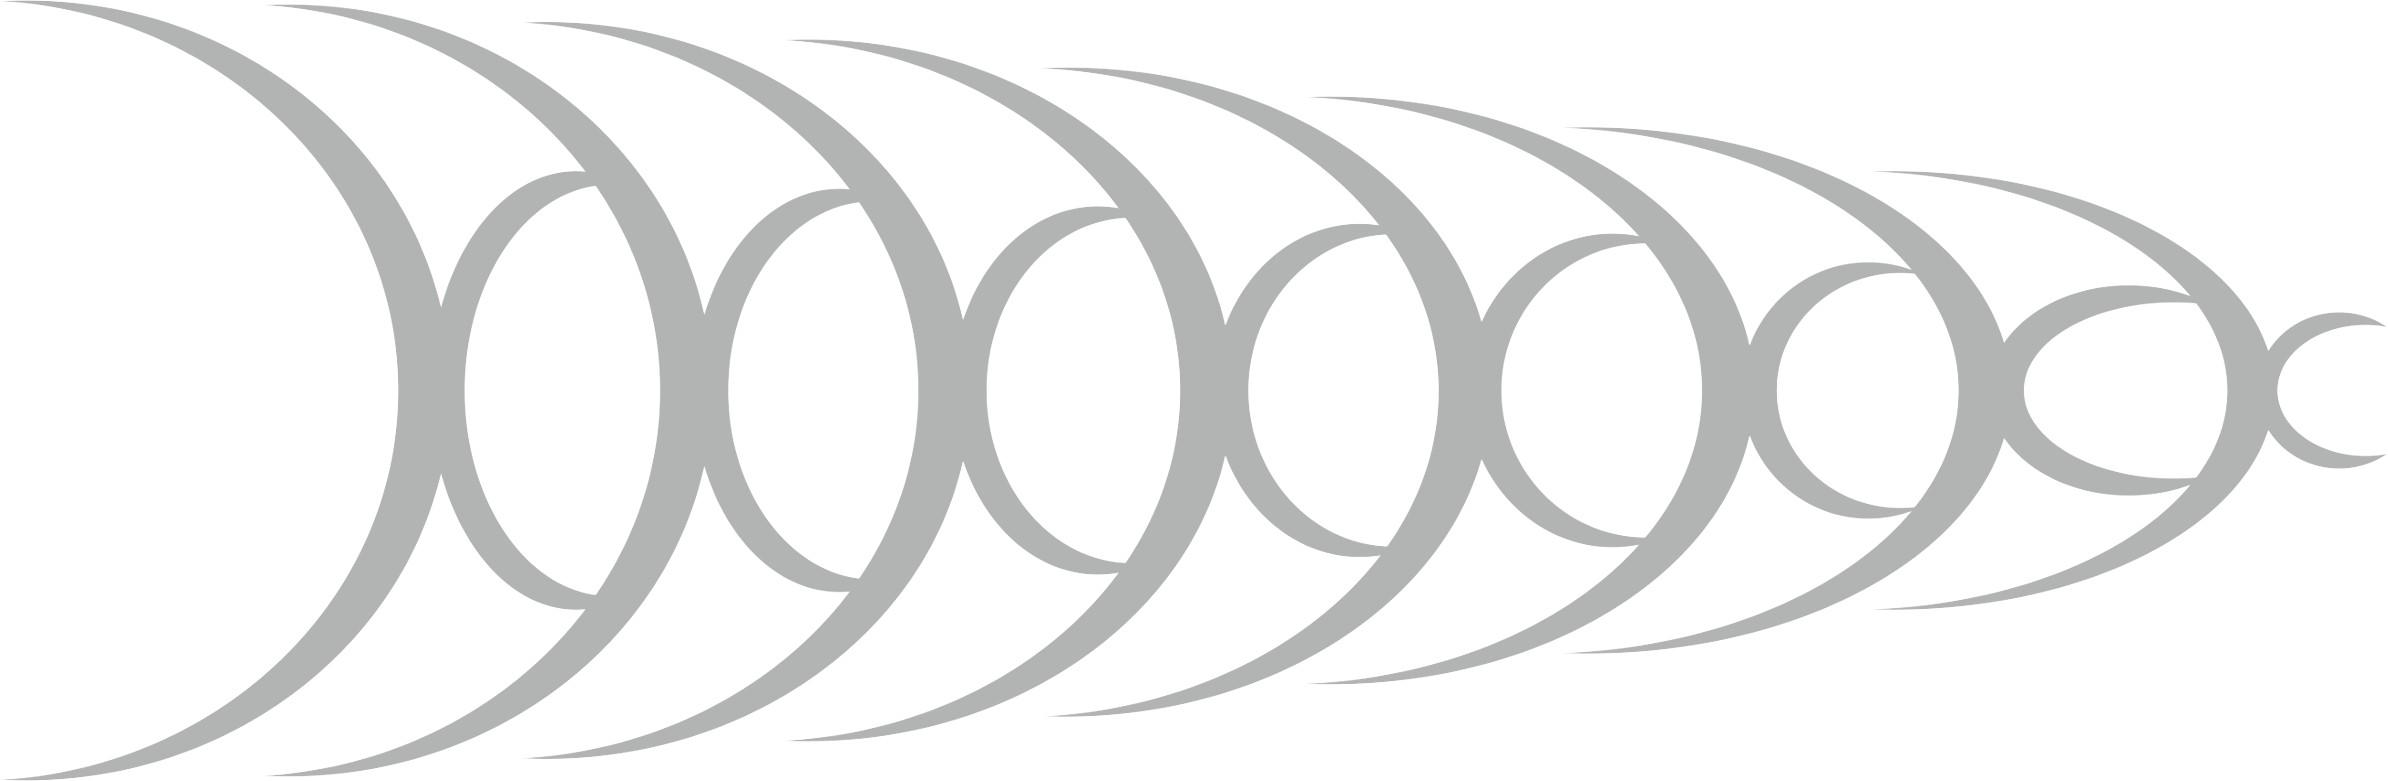 Car-tattoo sound waves 1360 x 425 mm silver – Bild 1